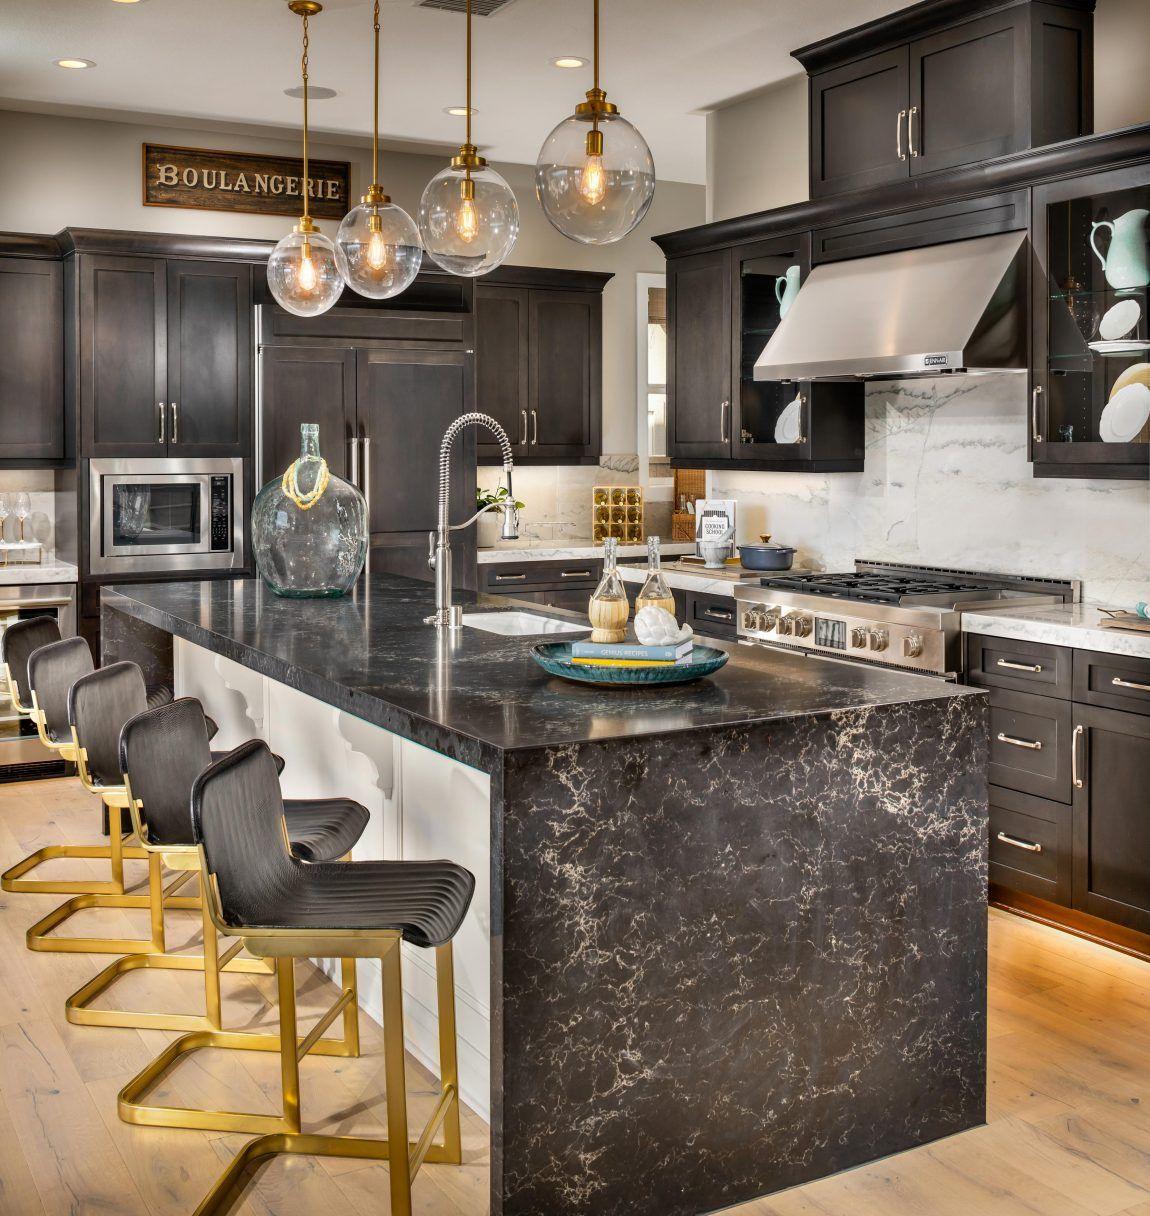 25 Luxury Kitchen Ideas For Your Dream Home Build Beautiful In 2020 Luxury Kitchens Kitchen Design Luxury Kitchen